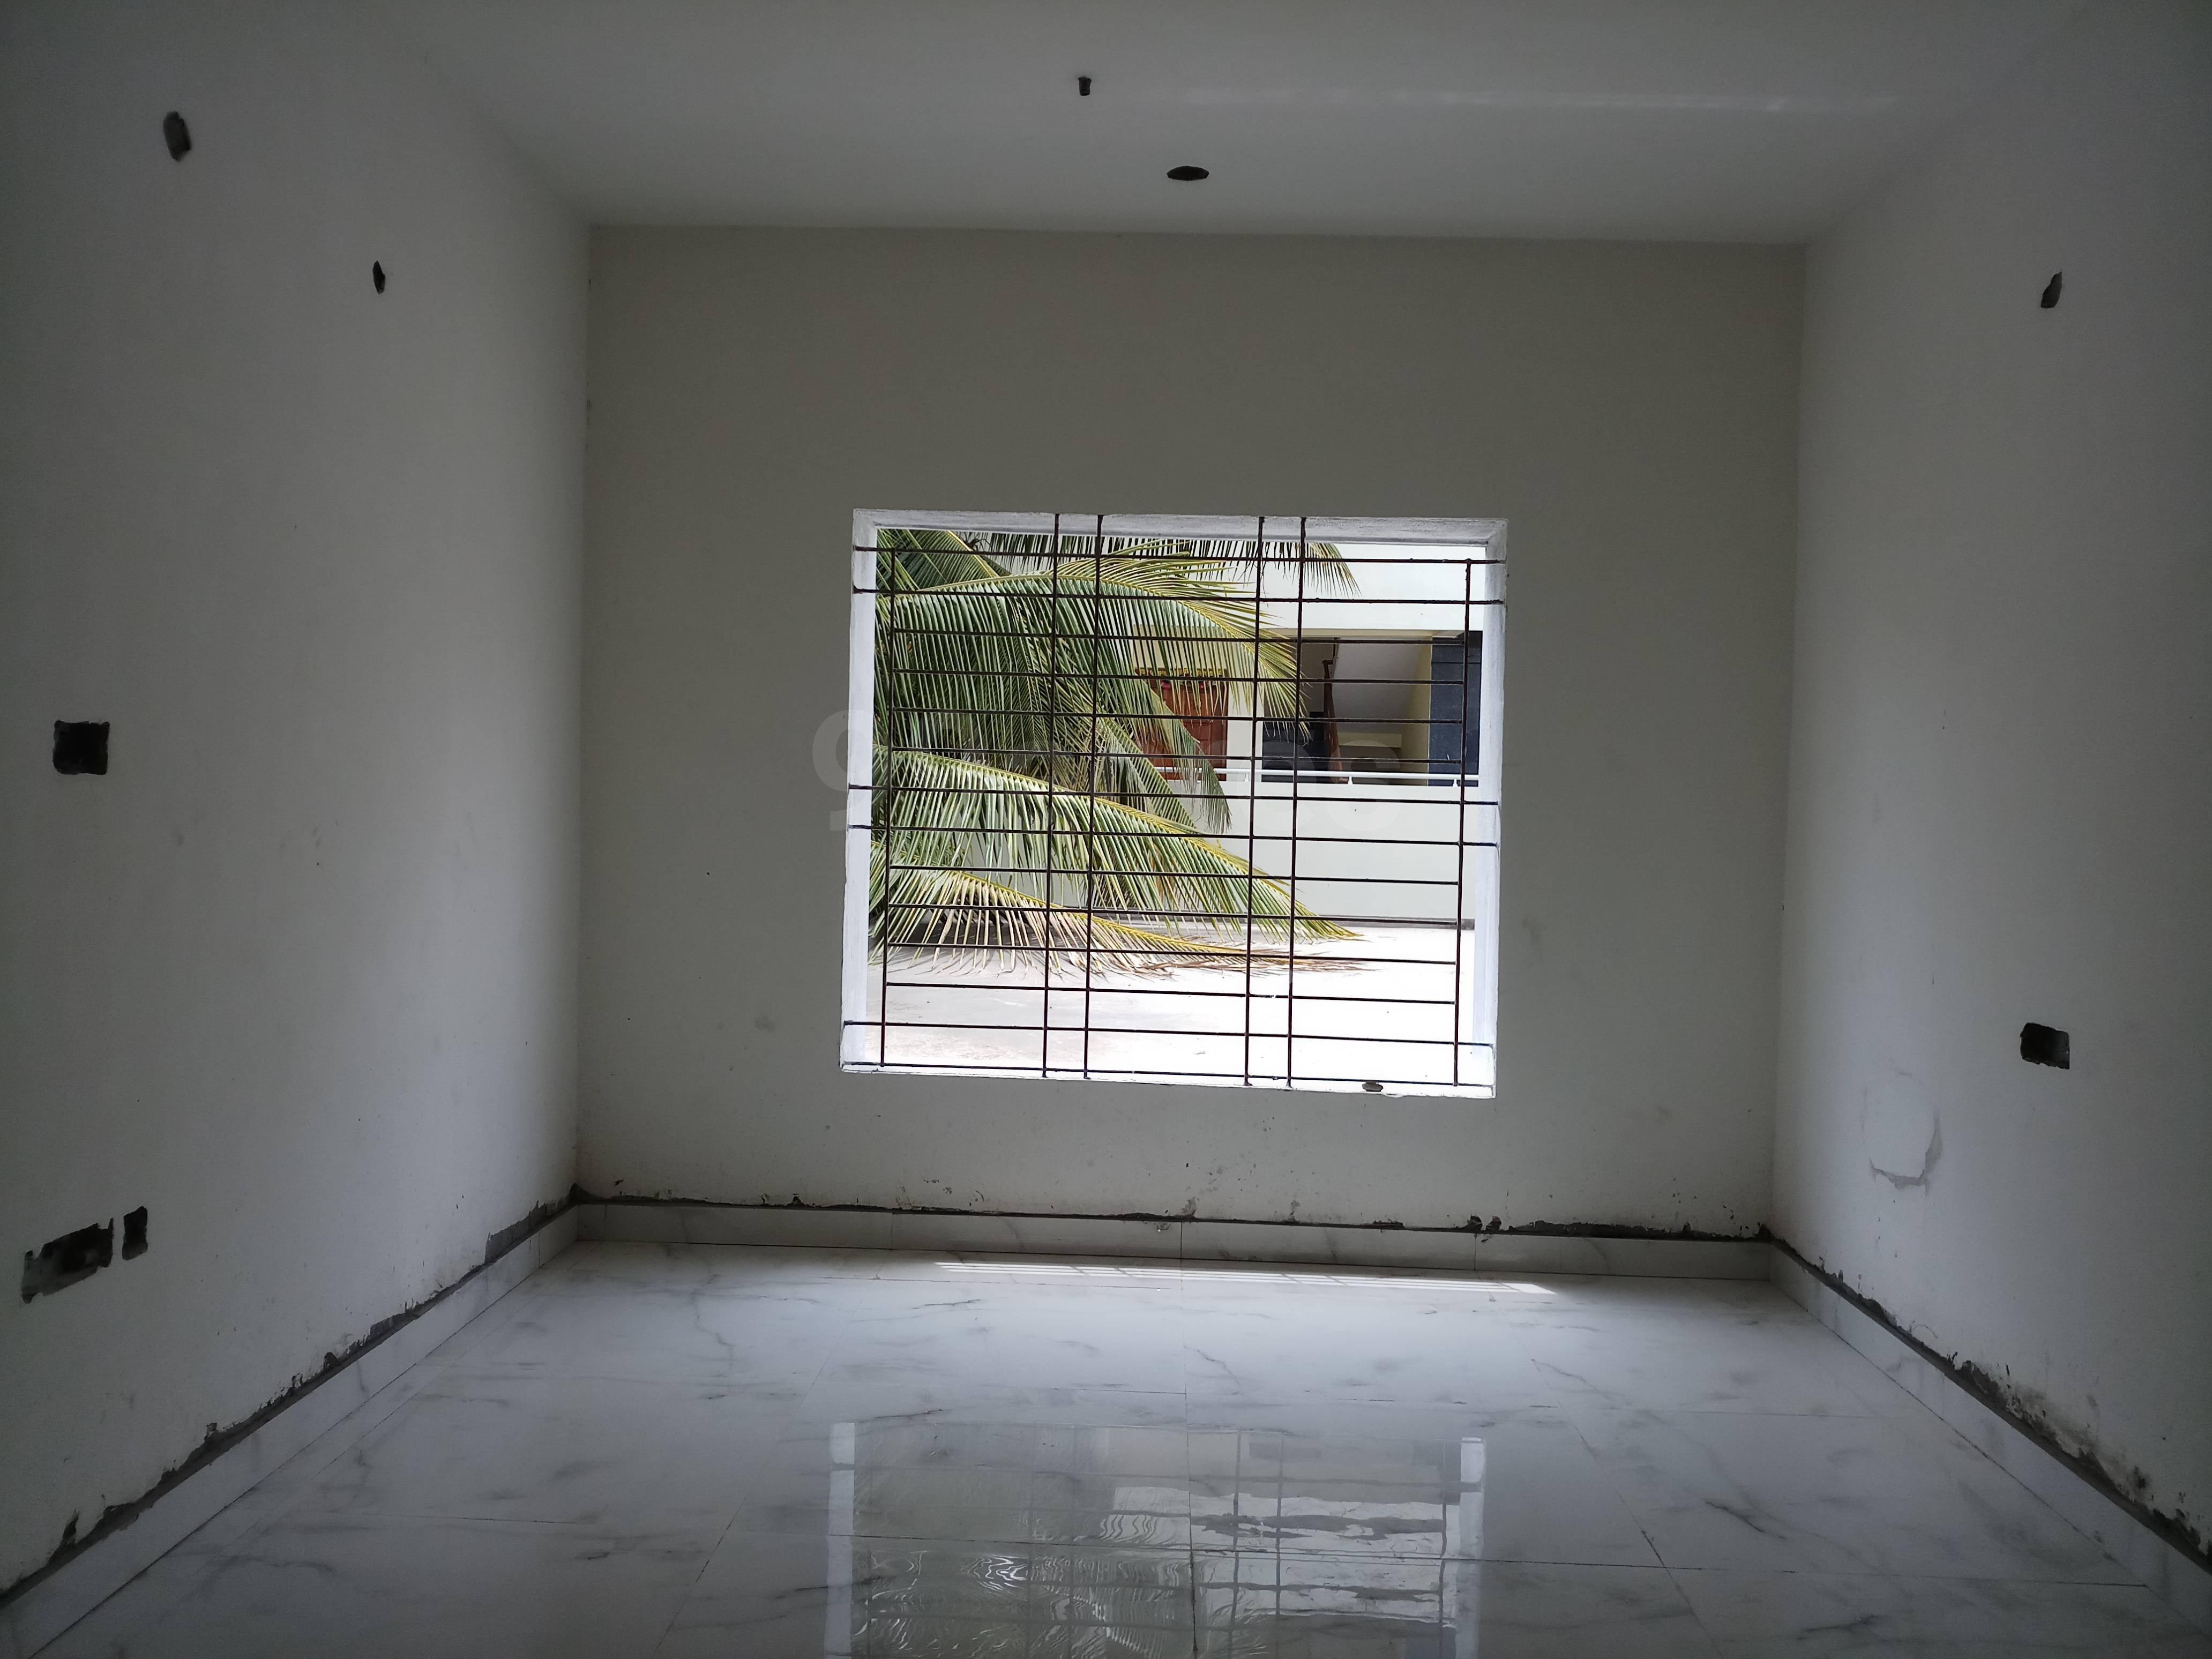 1560333103_banner_bangalore_1.jpeg